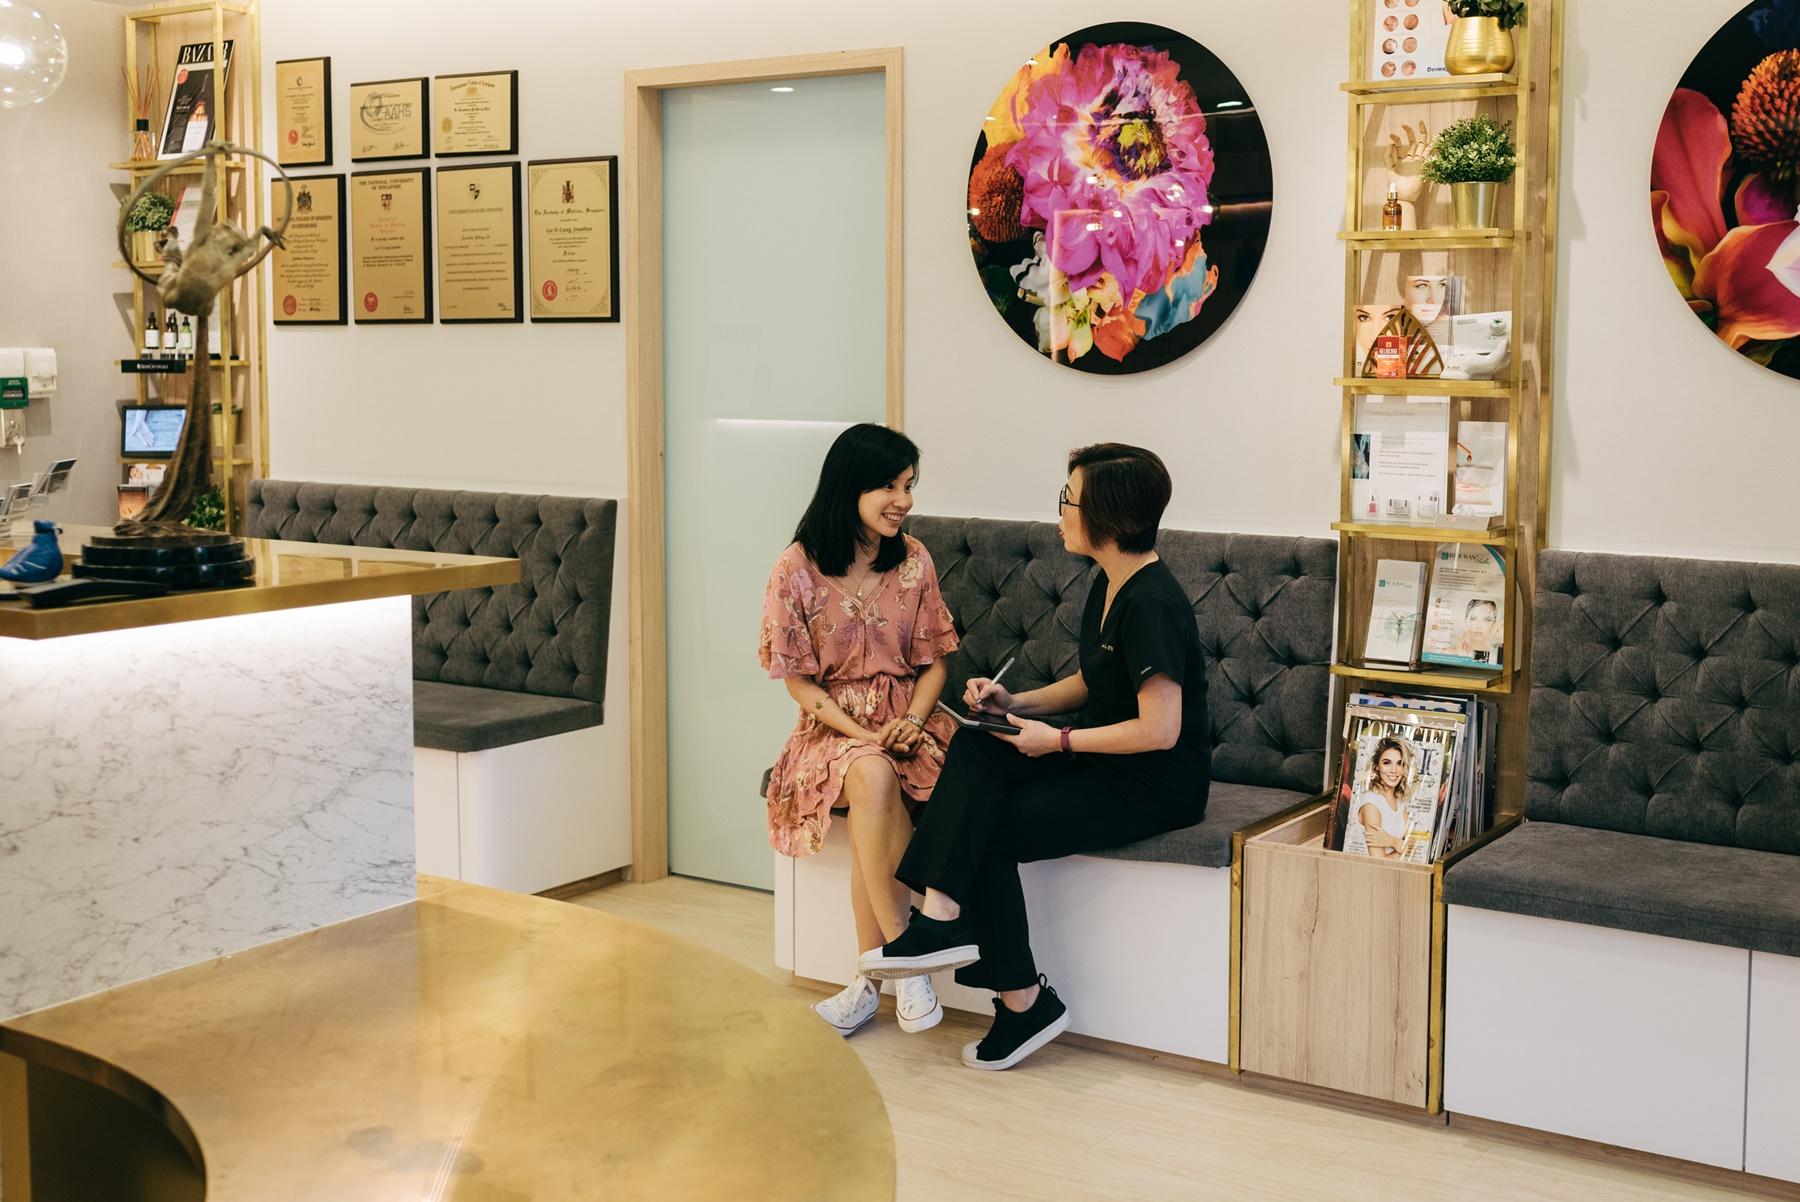 AestheticClinic-5504.jpg